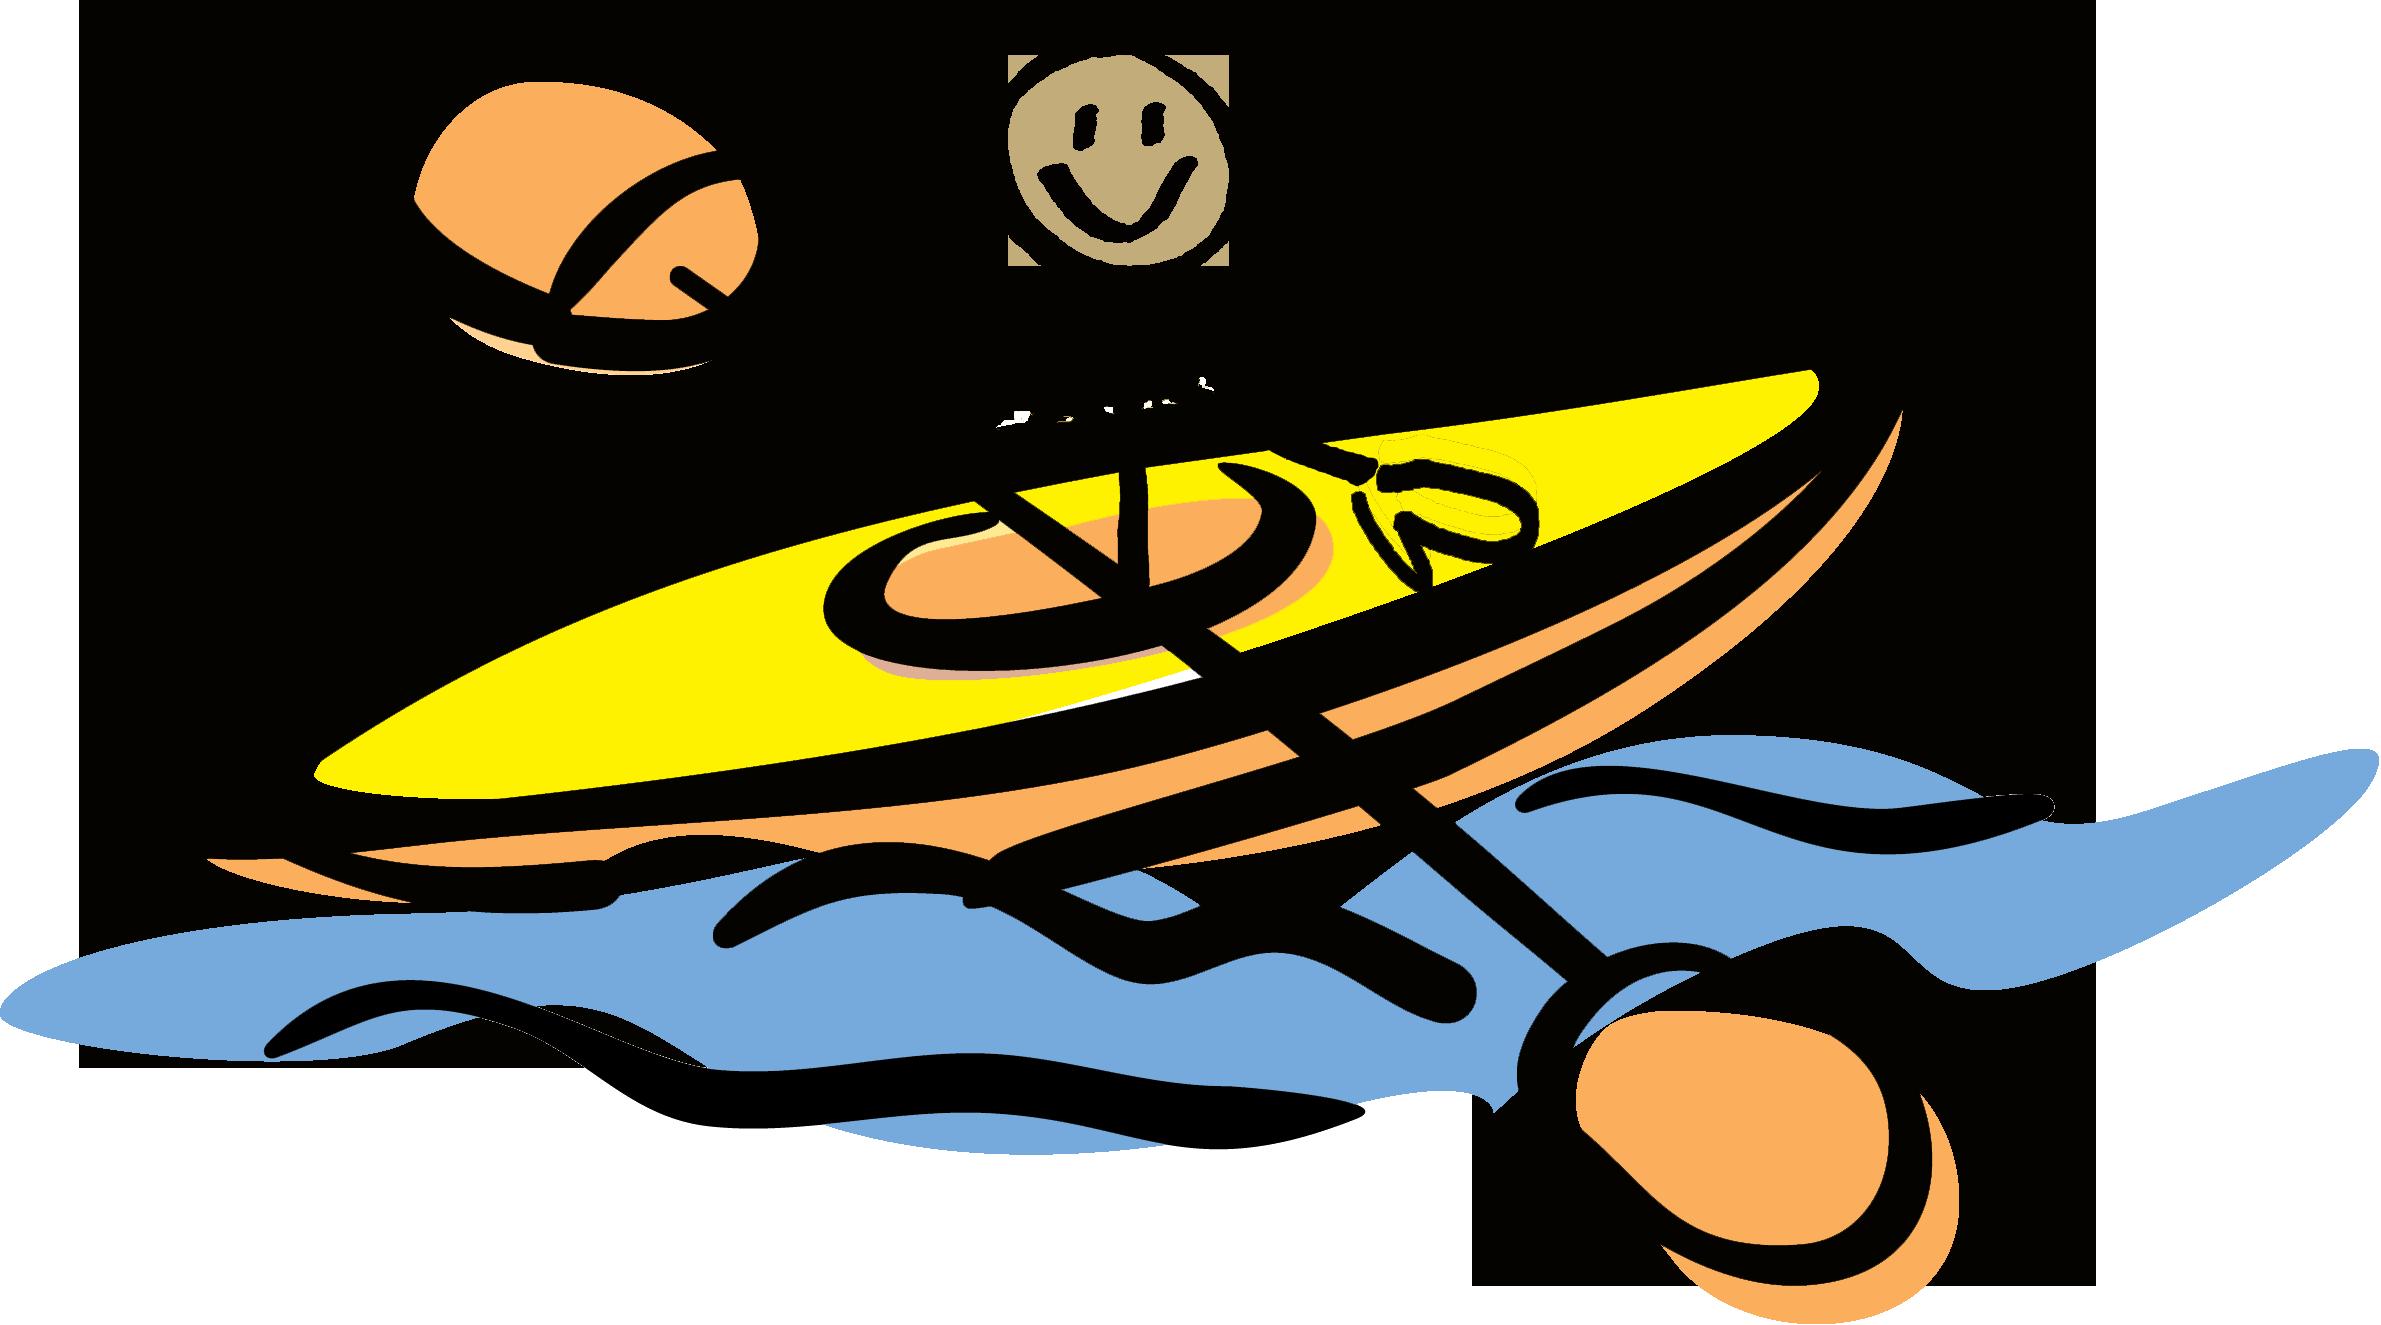 image free stock Kayak canoe race free. Kayaking clipart cartoon.